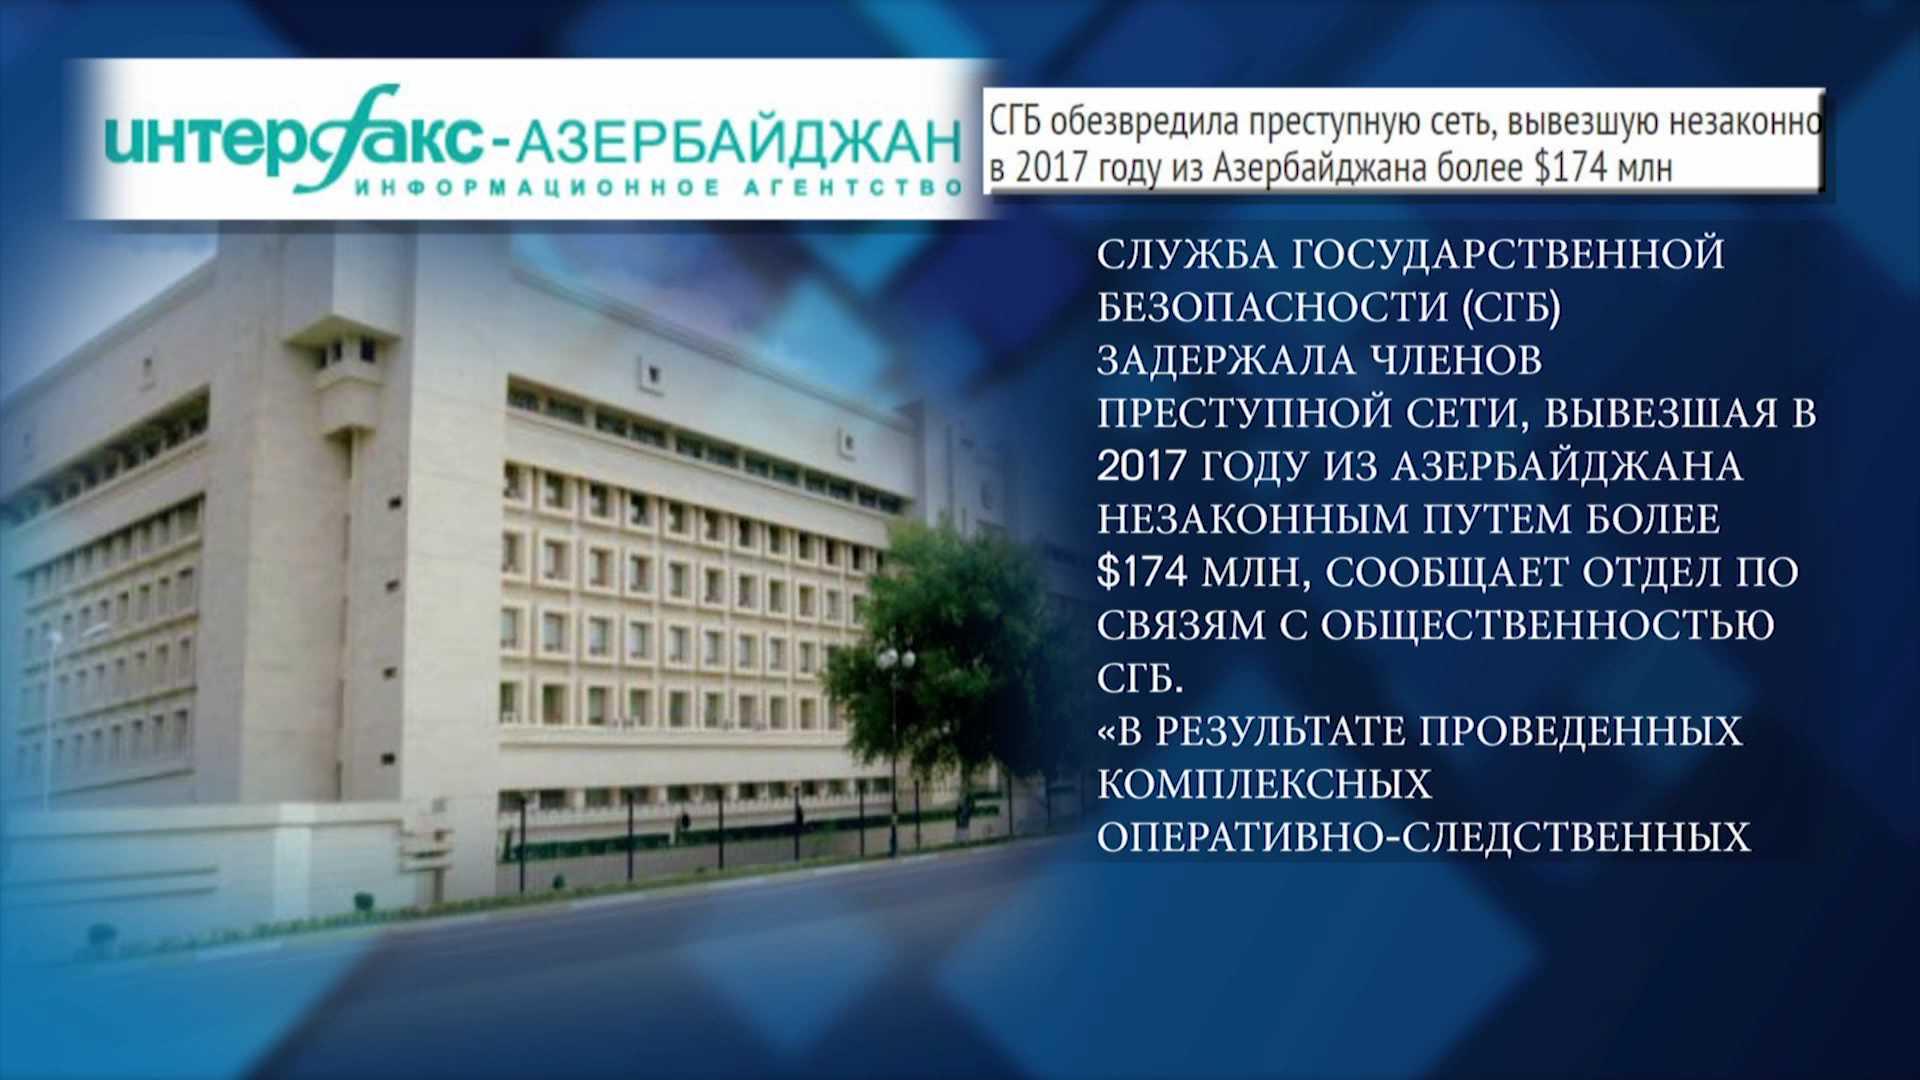 Georgia was detained in Azerbaijan